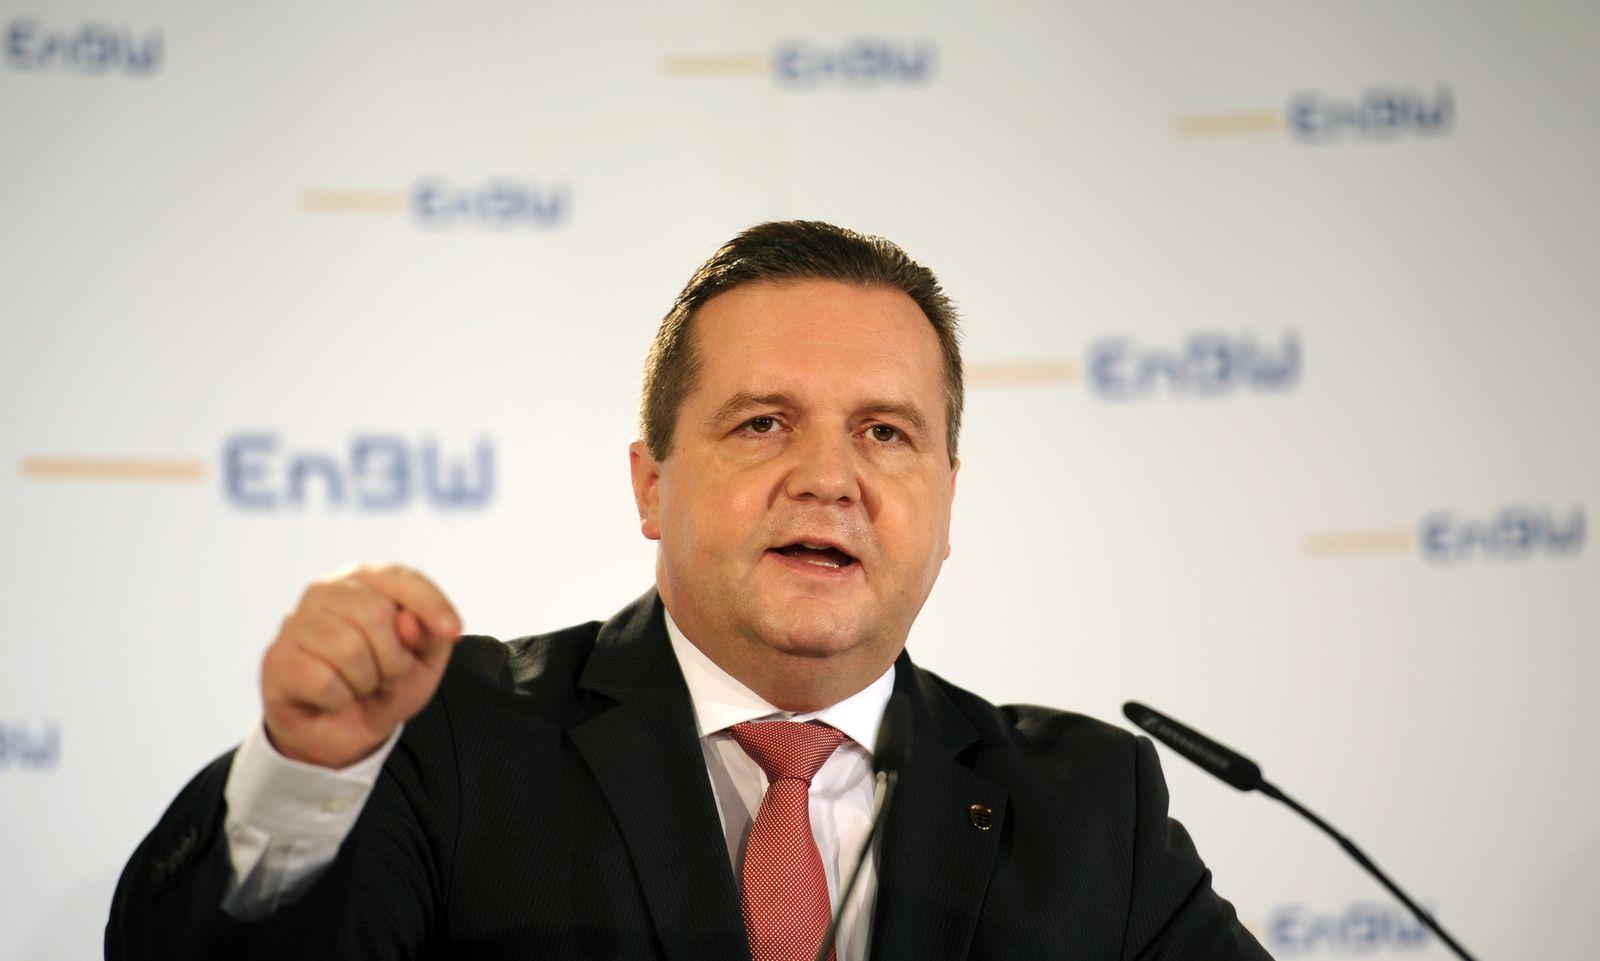 Stefan Mappus